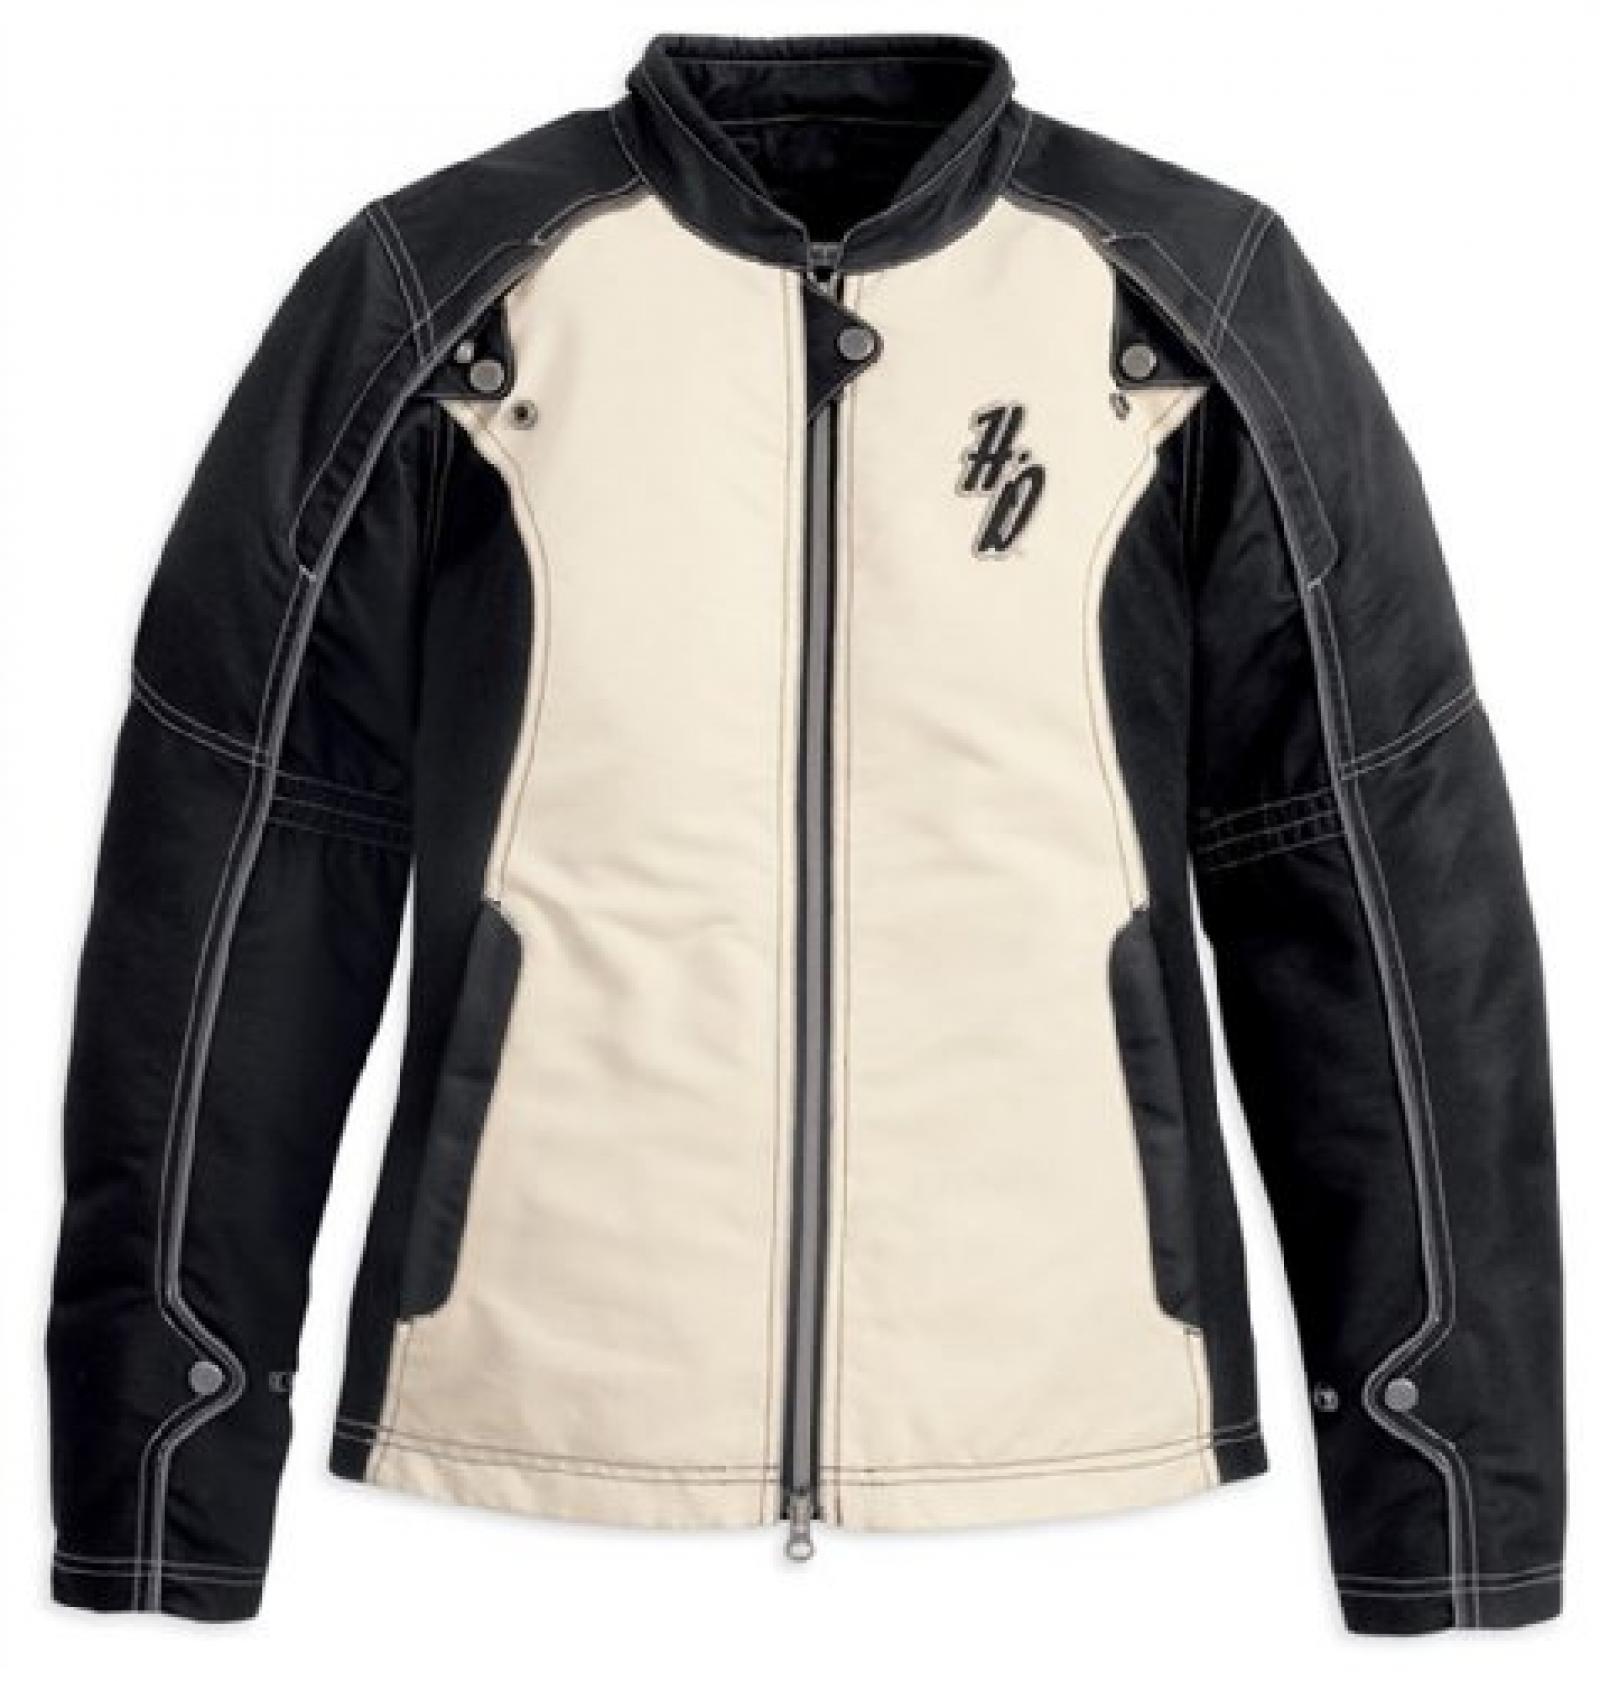 Harley-Davidson Sidewinder RCS Functional Jacket 97309-13VW Damen Outerwear